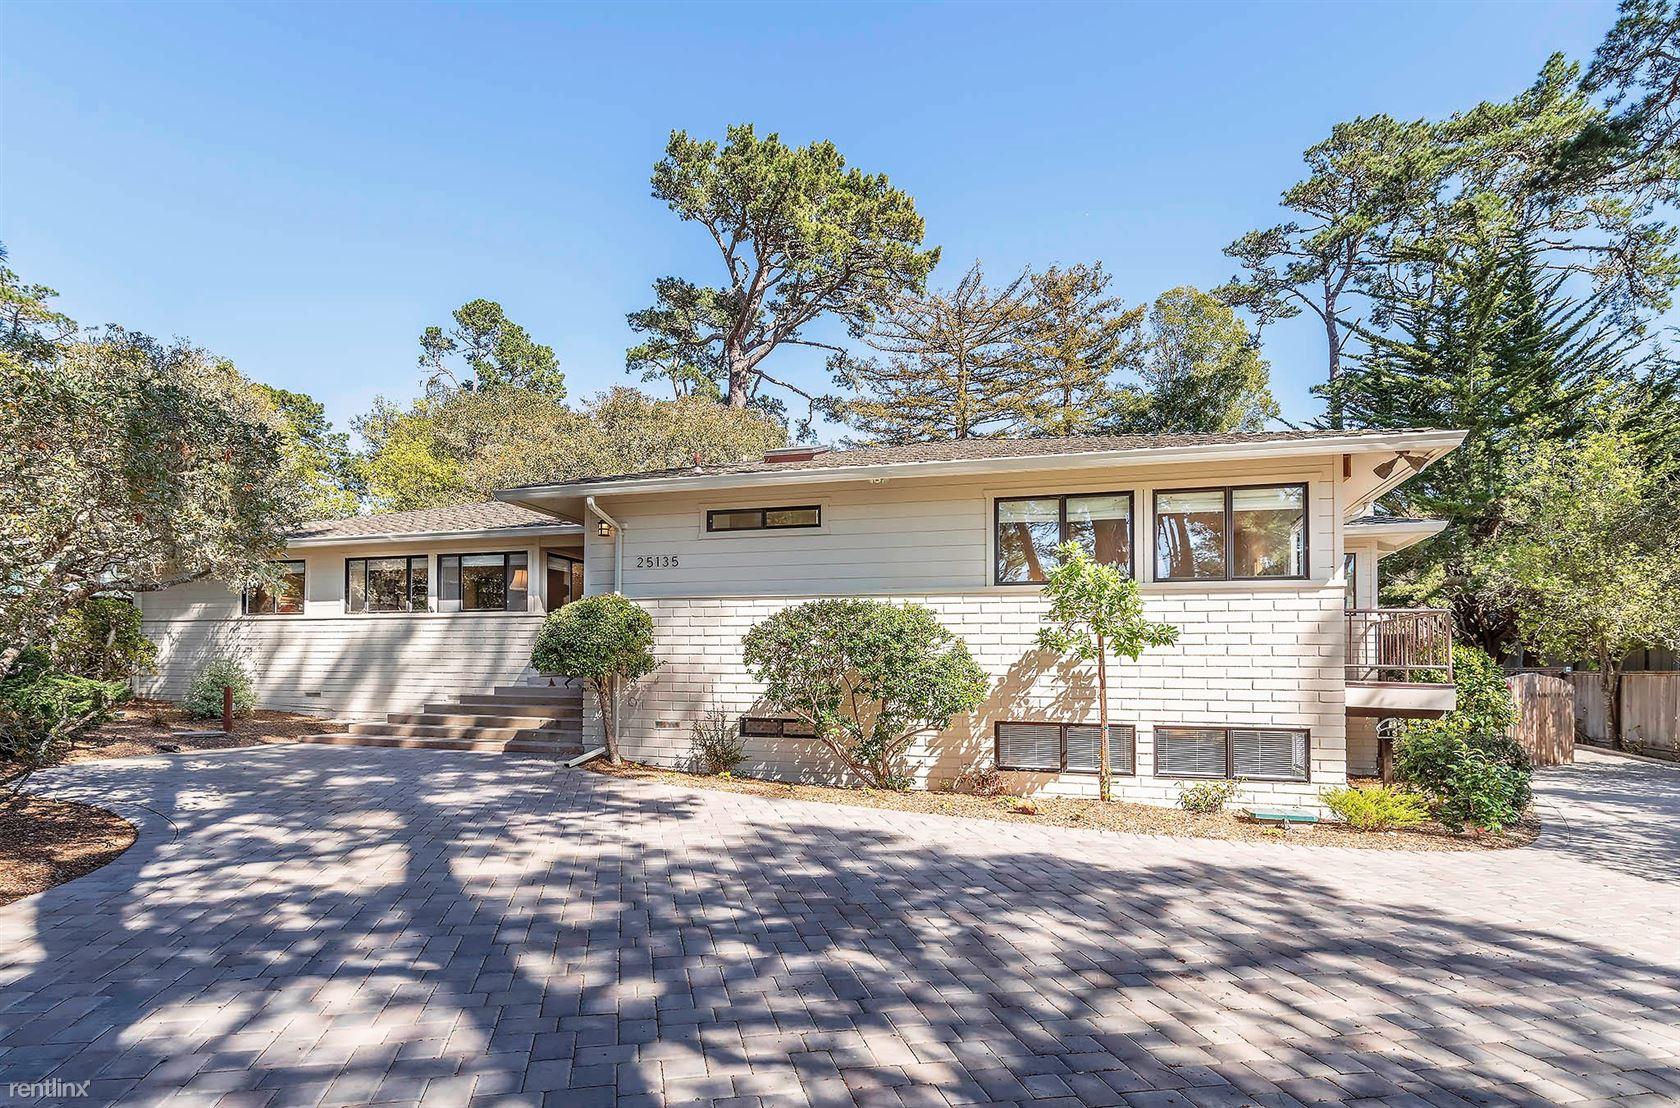 25135 Monterey St, Carmel, CA - $8,560 USD/ month